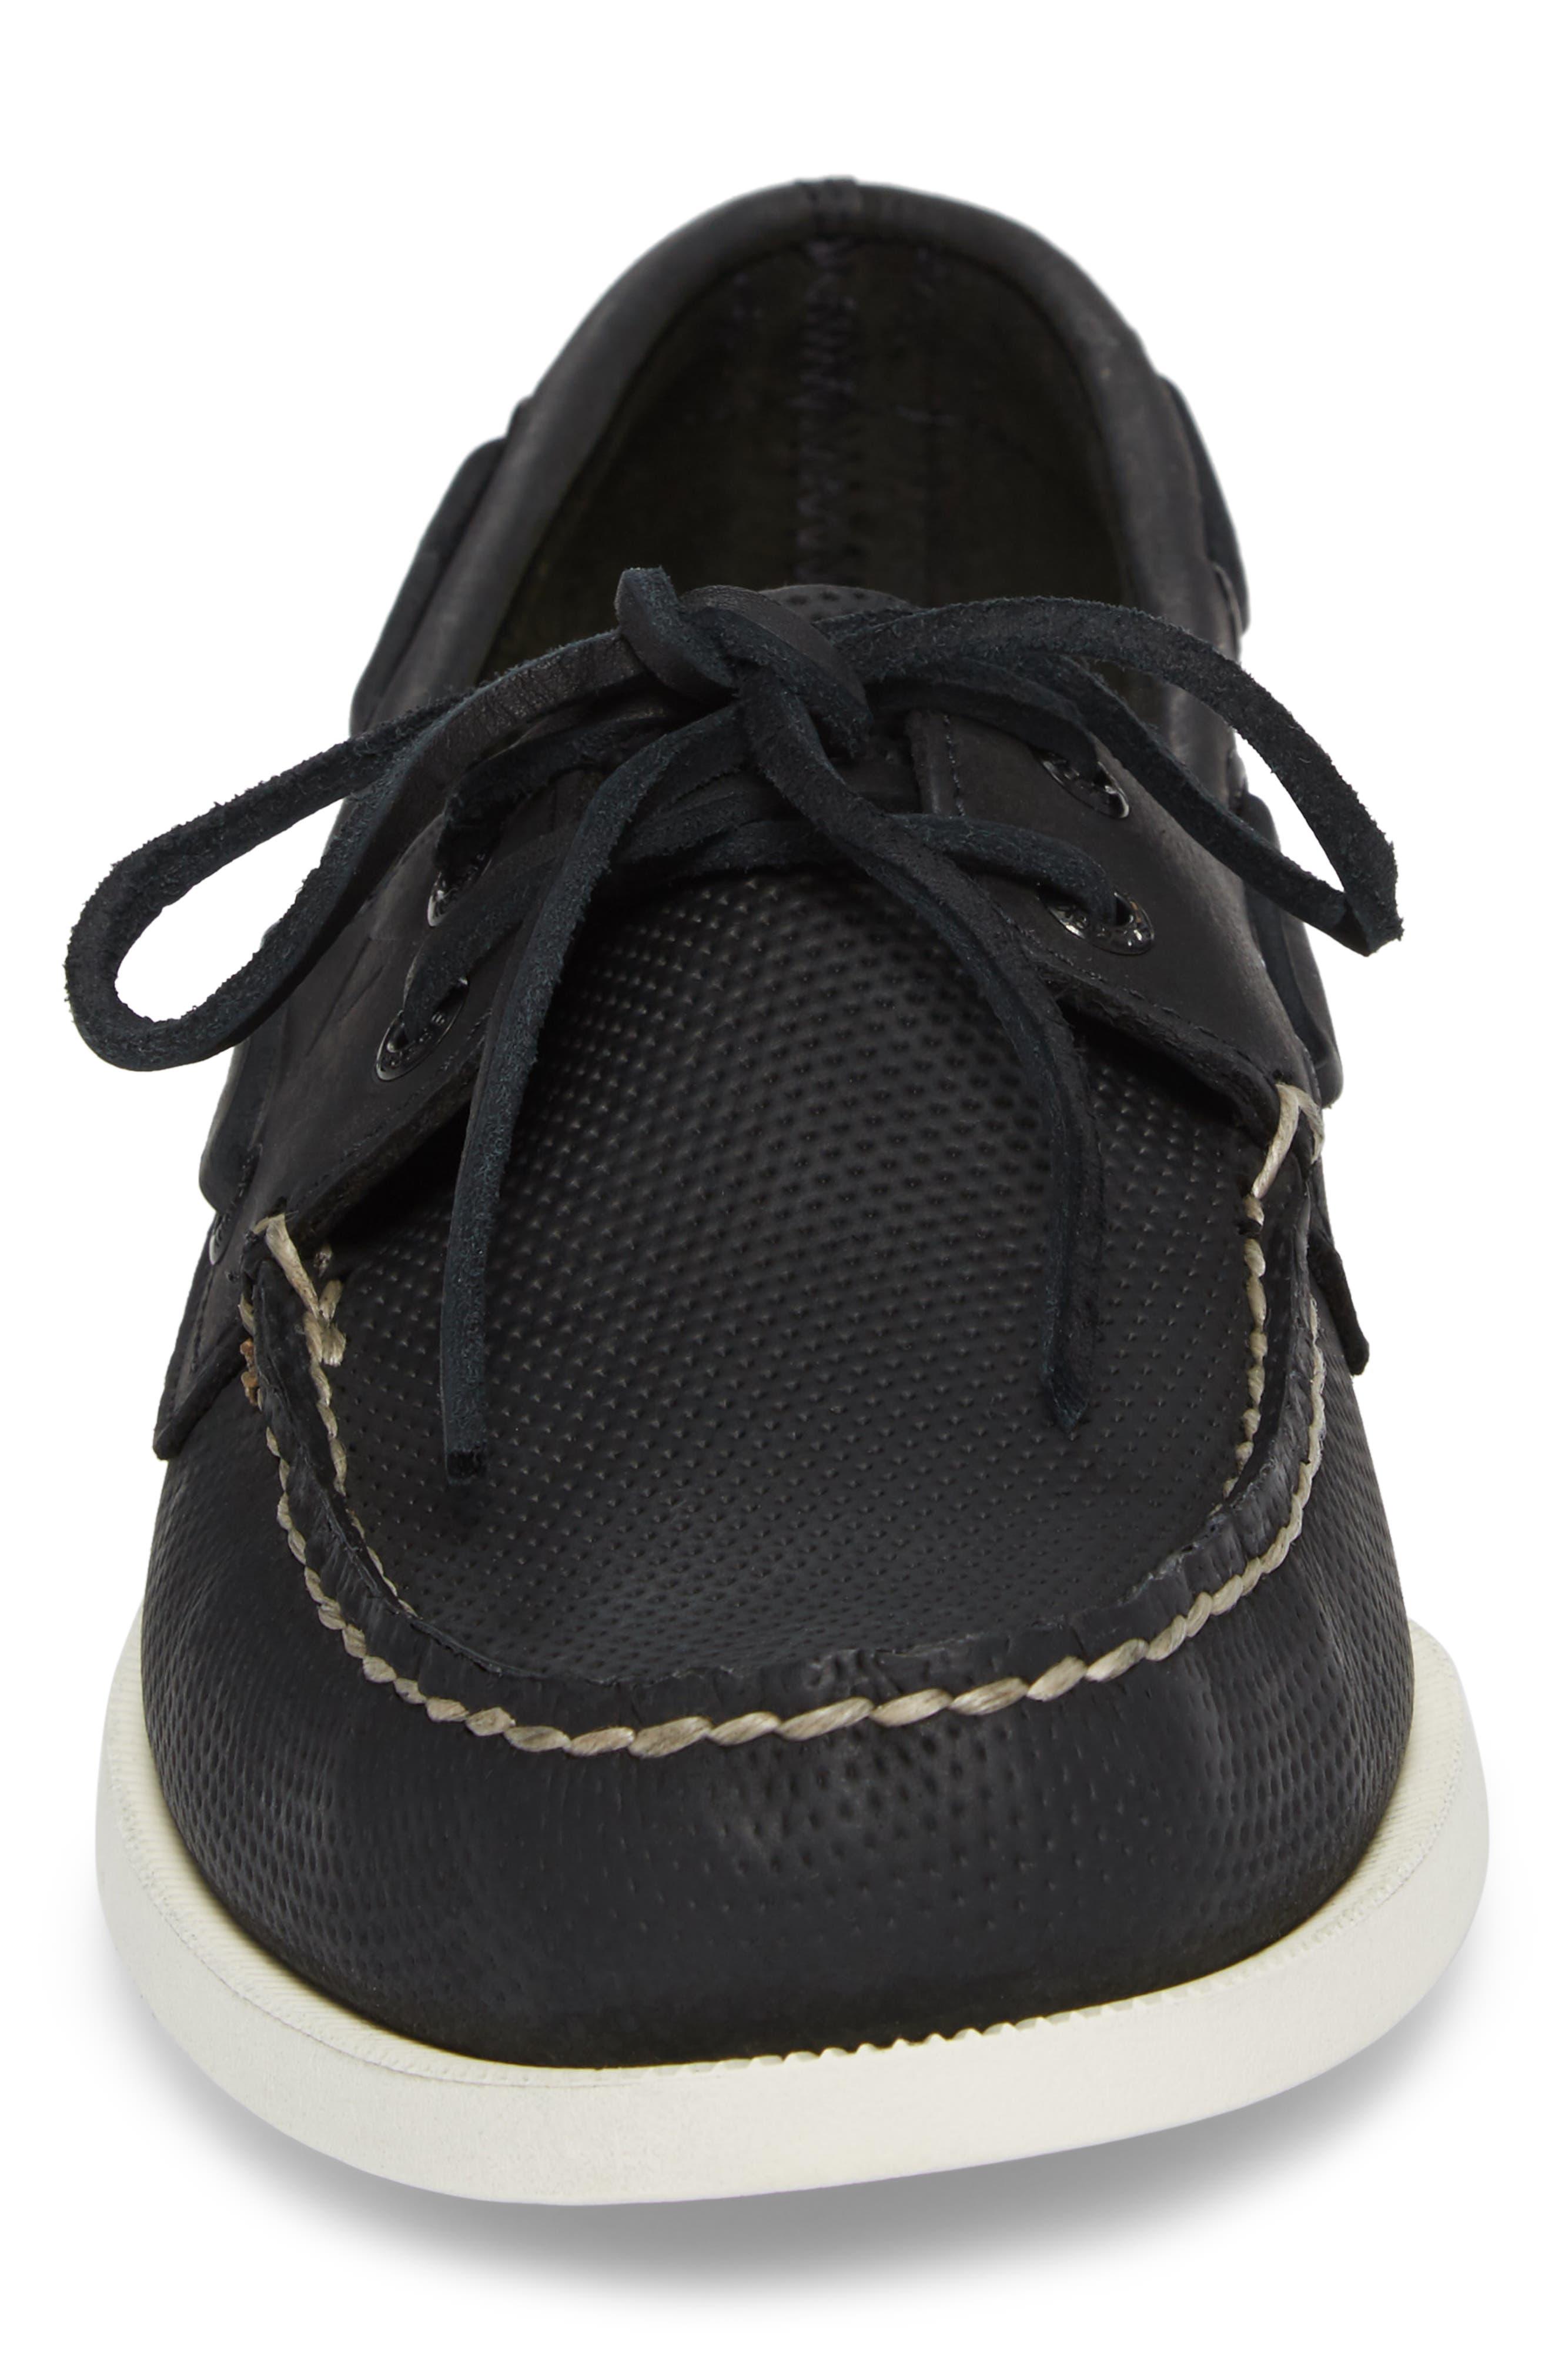 Alternate Image 4  - Sperry AO 2 Eye Perforated Boat Shoe (Men)